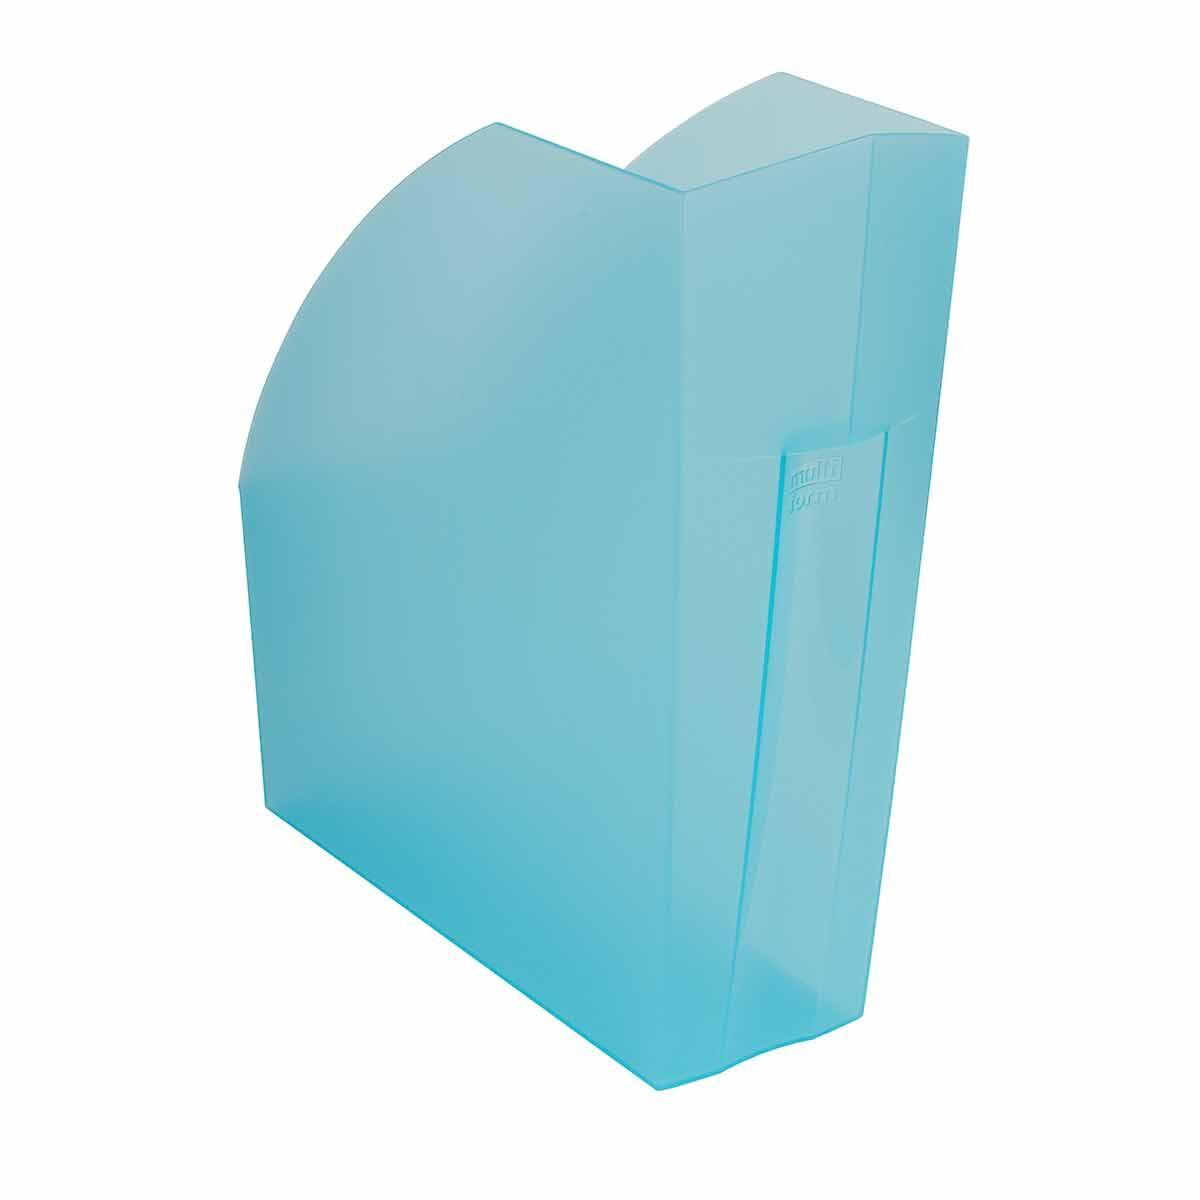 Exacompta Linicolor Magazine File Pack of 3 Turquoise